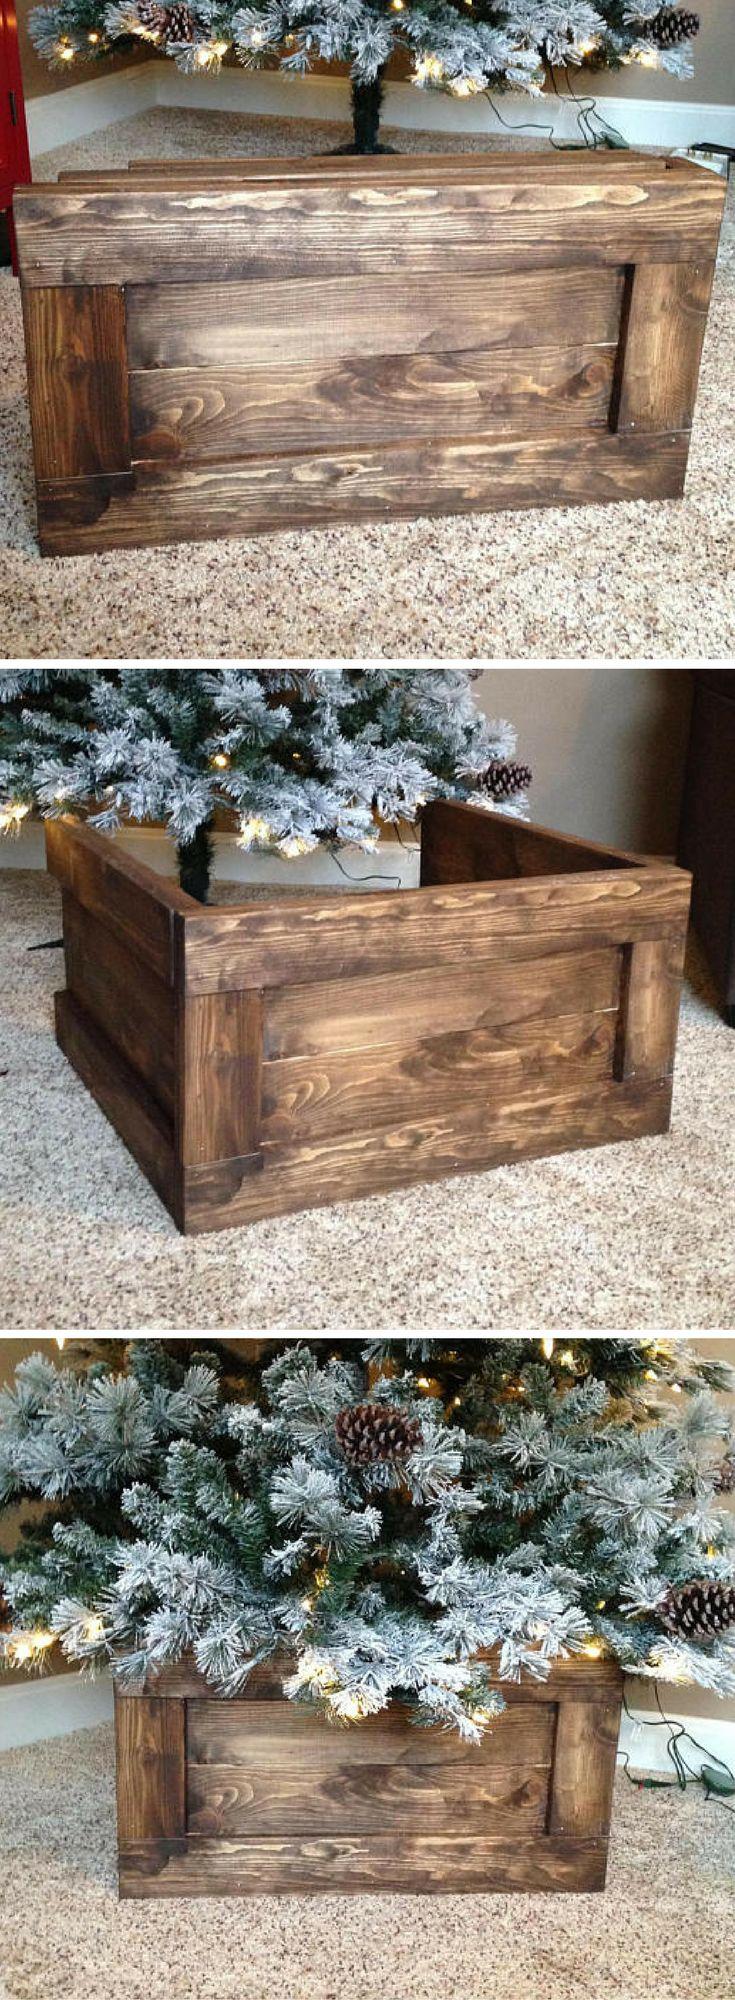 I Want!! Folding Christmas Tree Wood Box Stand!! #christmasdecor #farmhousedecor #ad